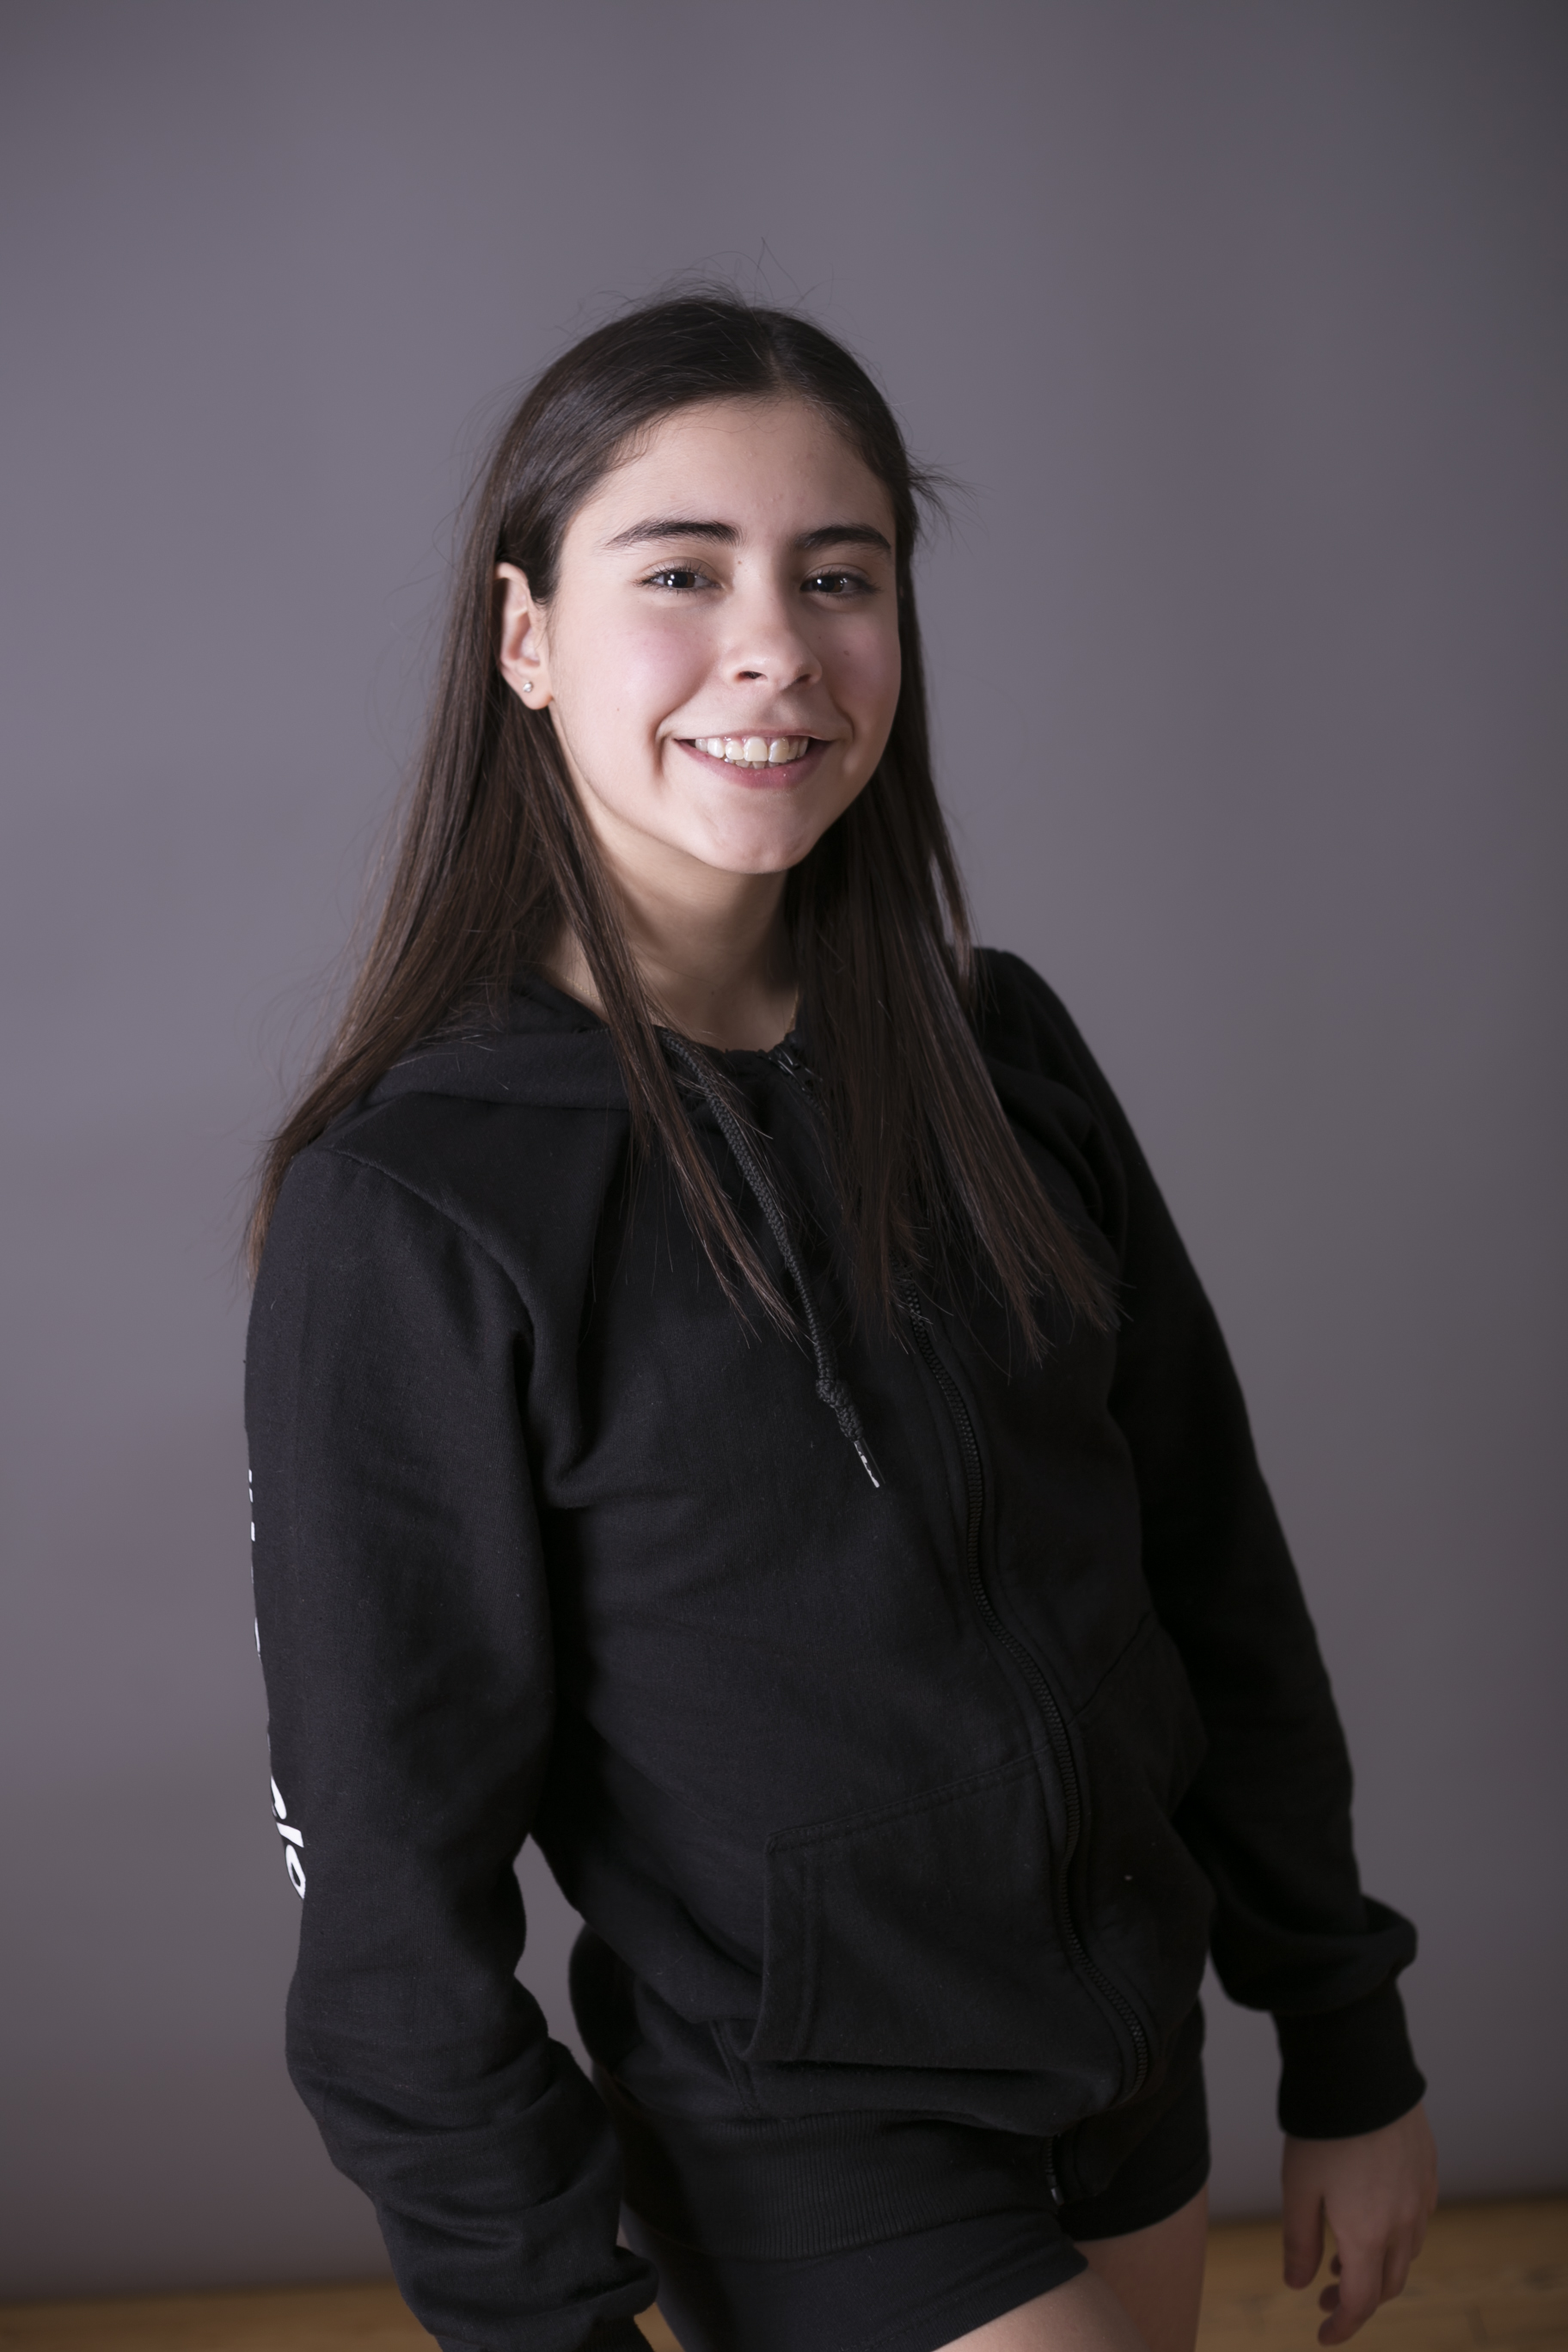 Natalia Borunda